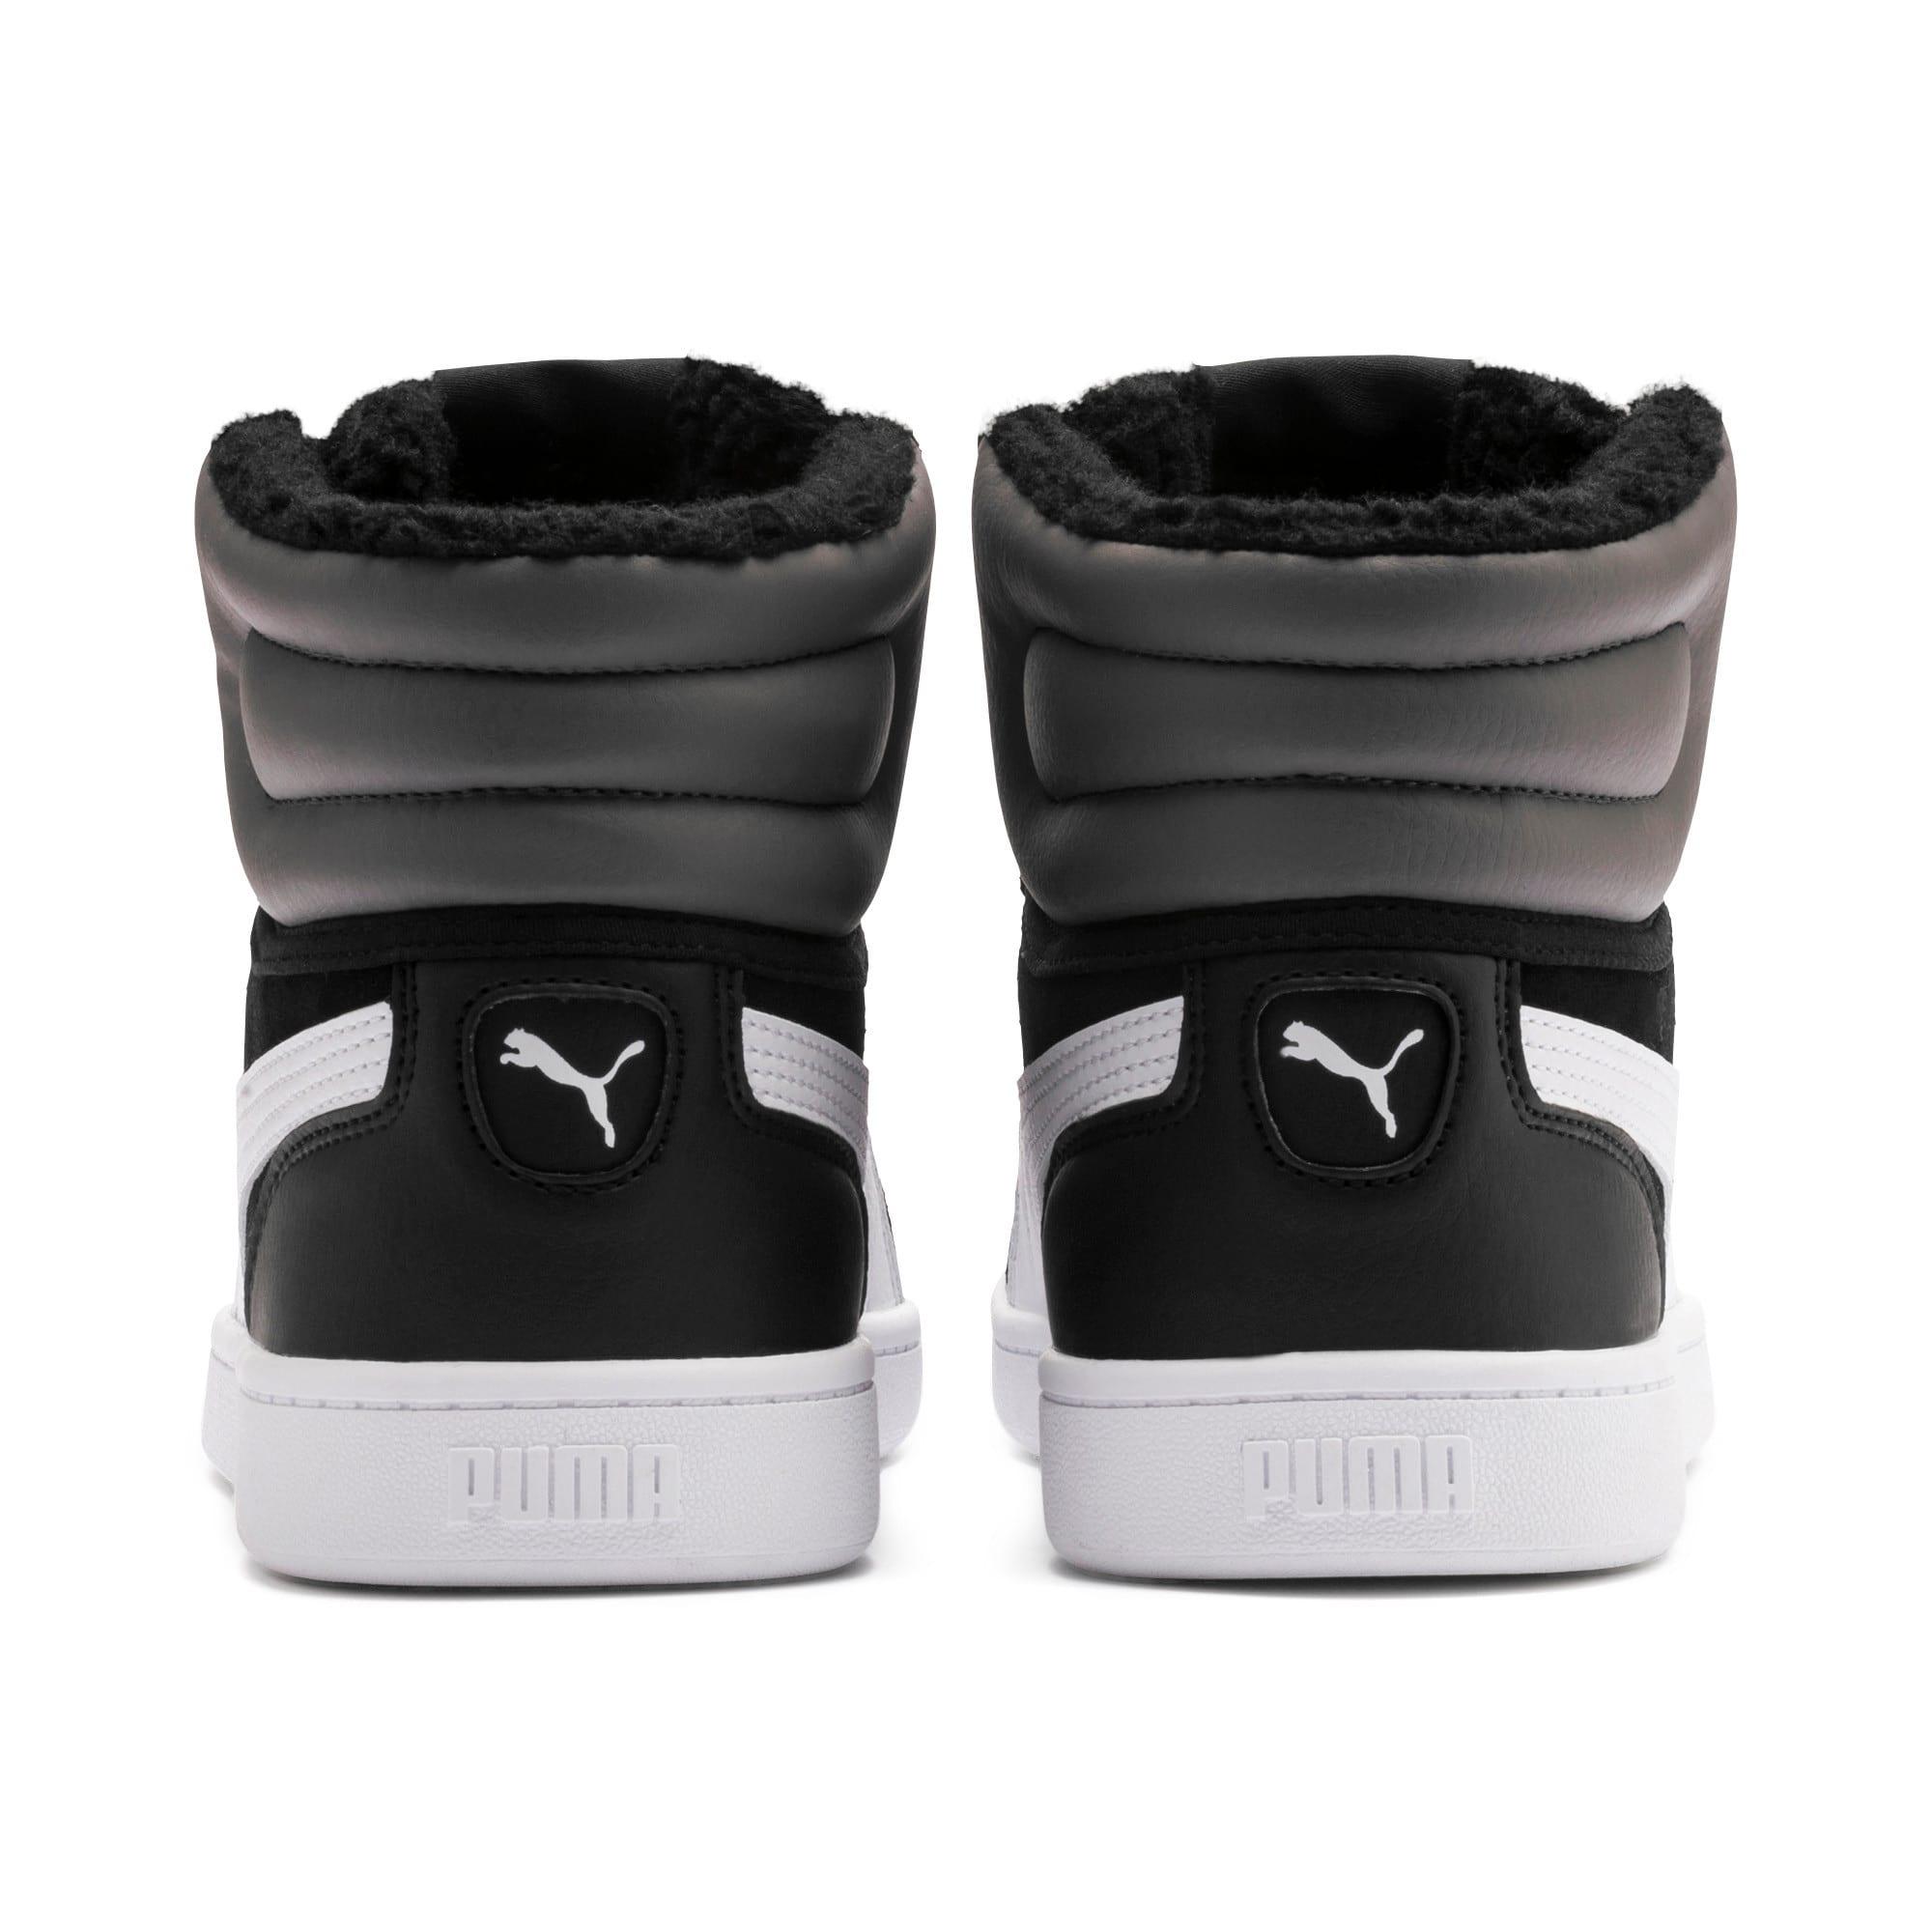 Thumbnail 3 of Vikky v2 Mid Fur Youth Mädchen Sneaker, Puma Black-CASTLEROCK-White, medium